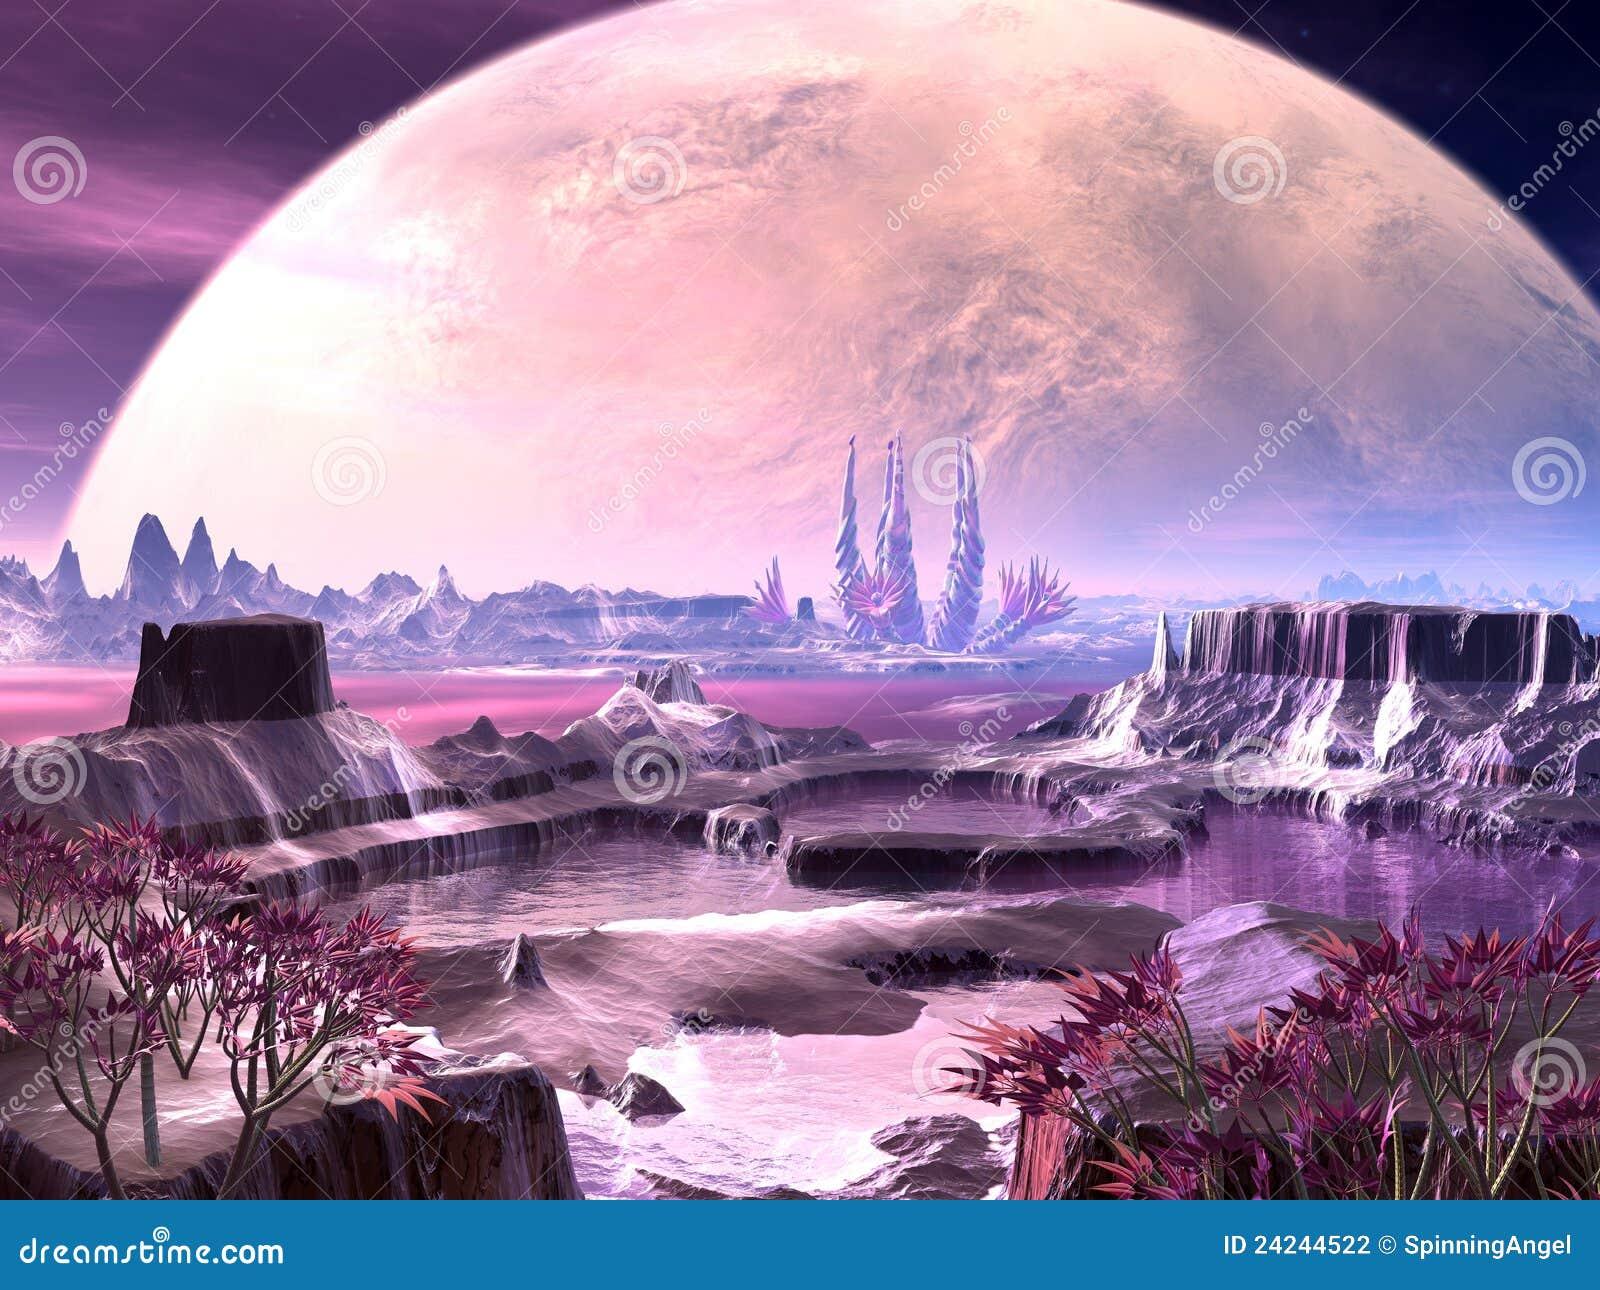 Alien Plant Life on Faraway Planet